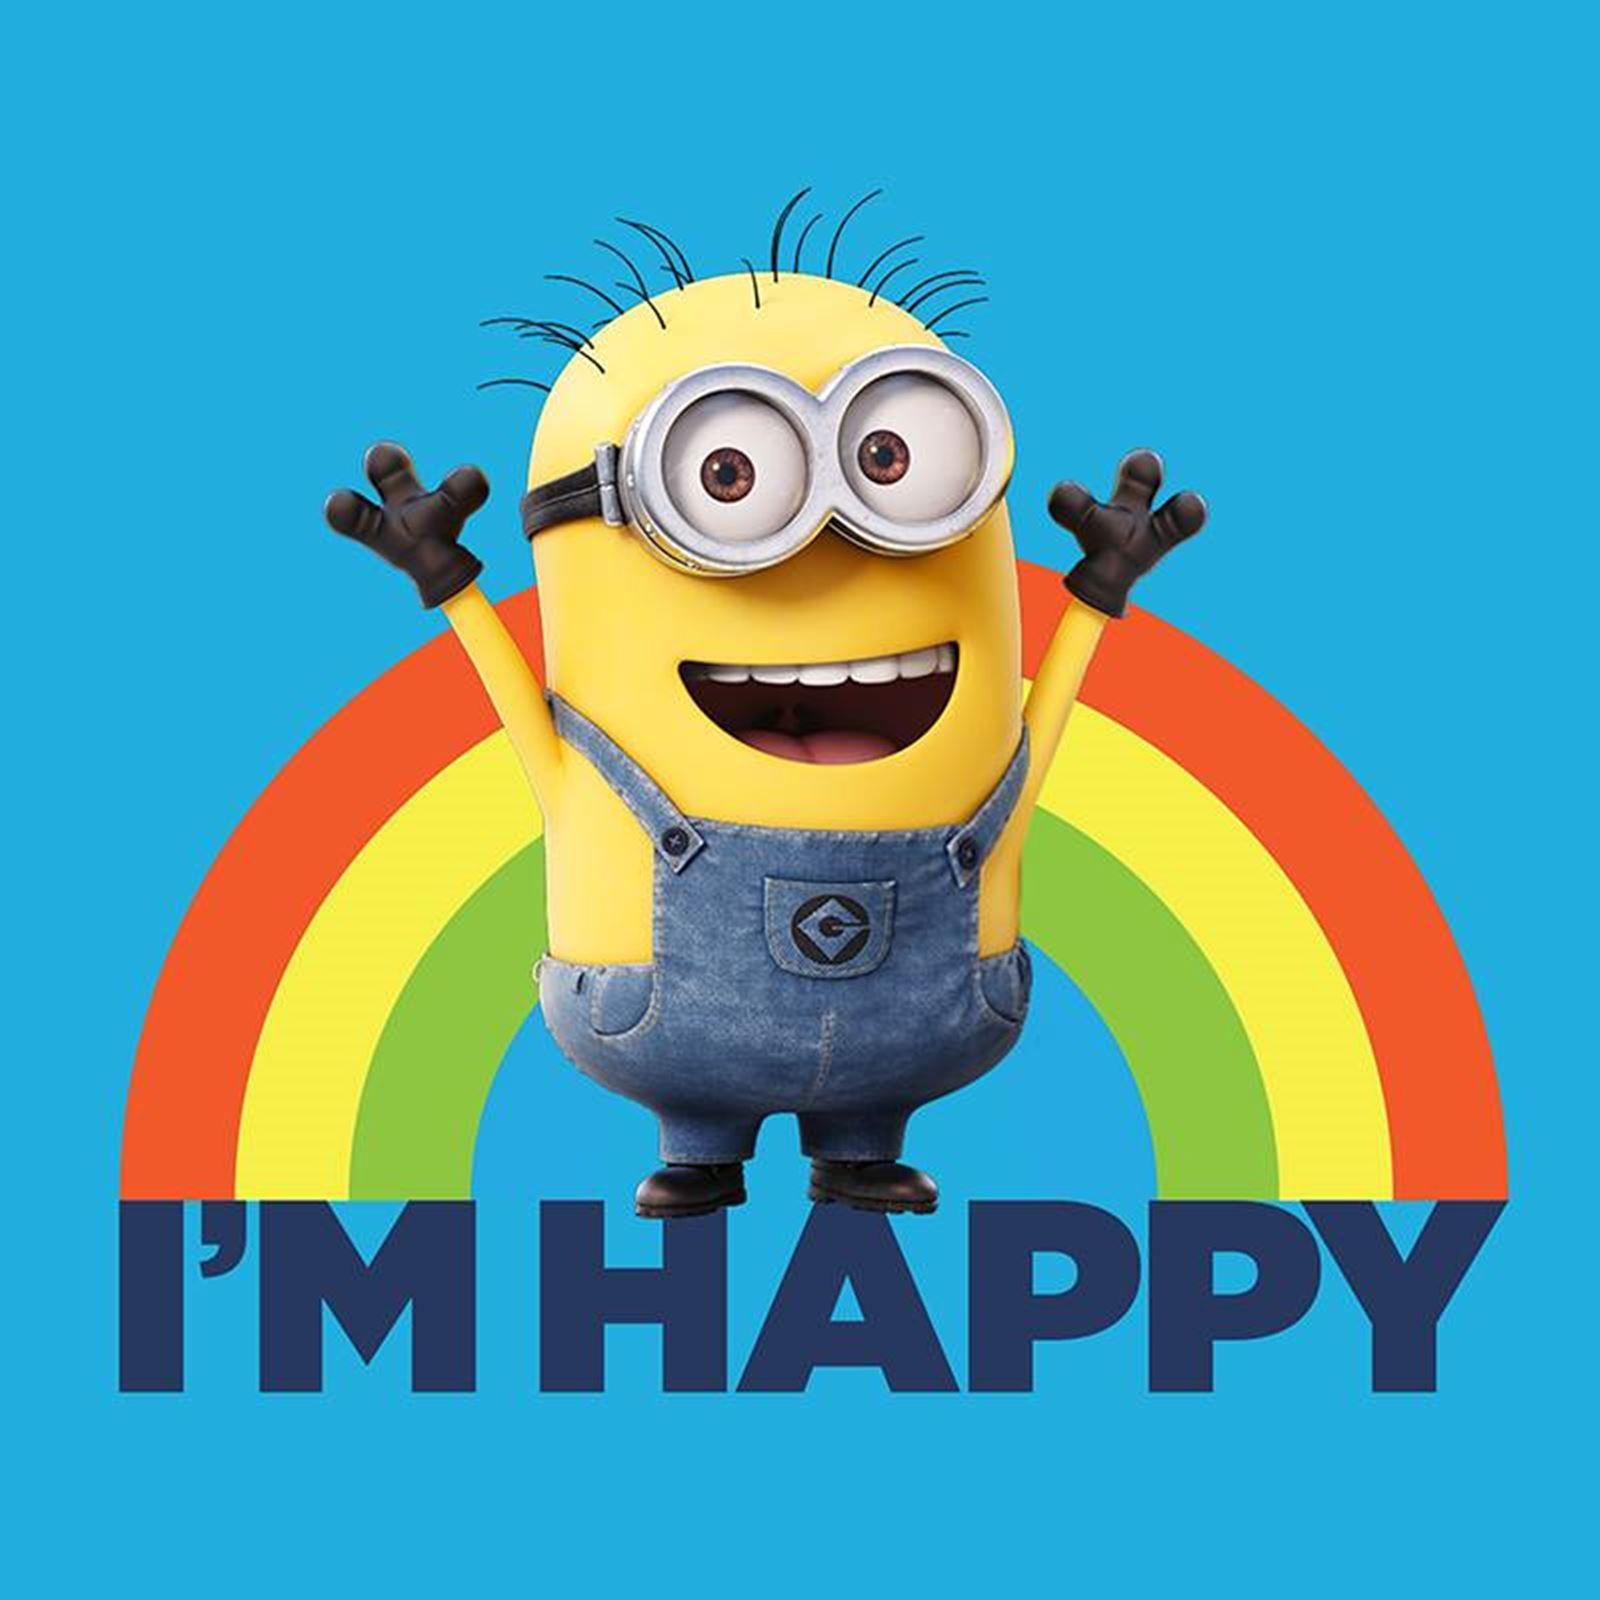 happy-minion-despicable-me-rainbow